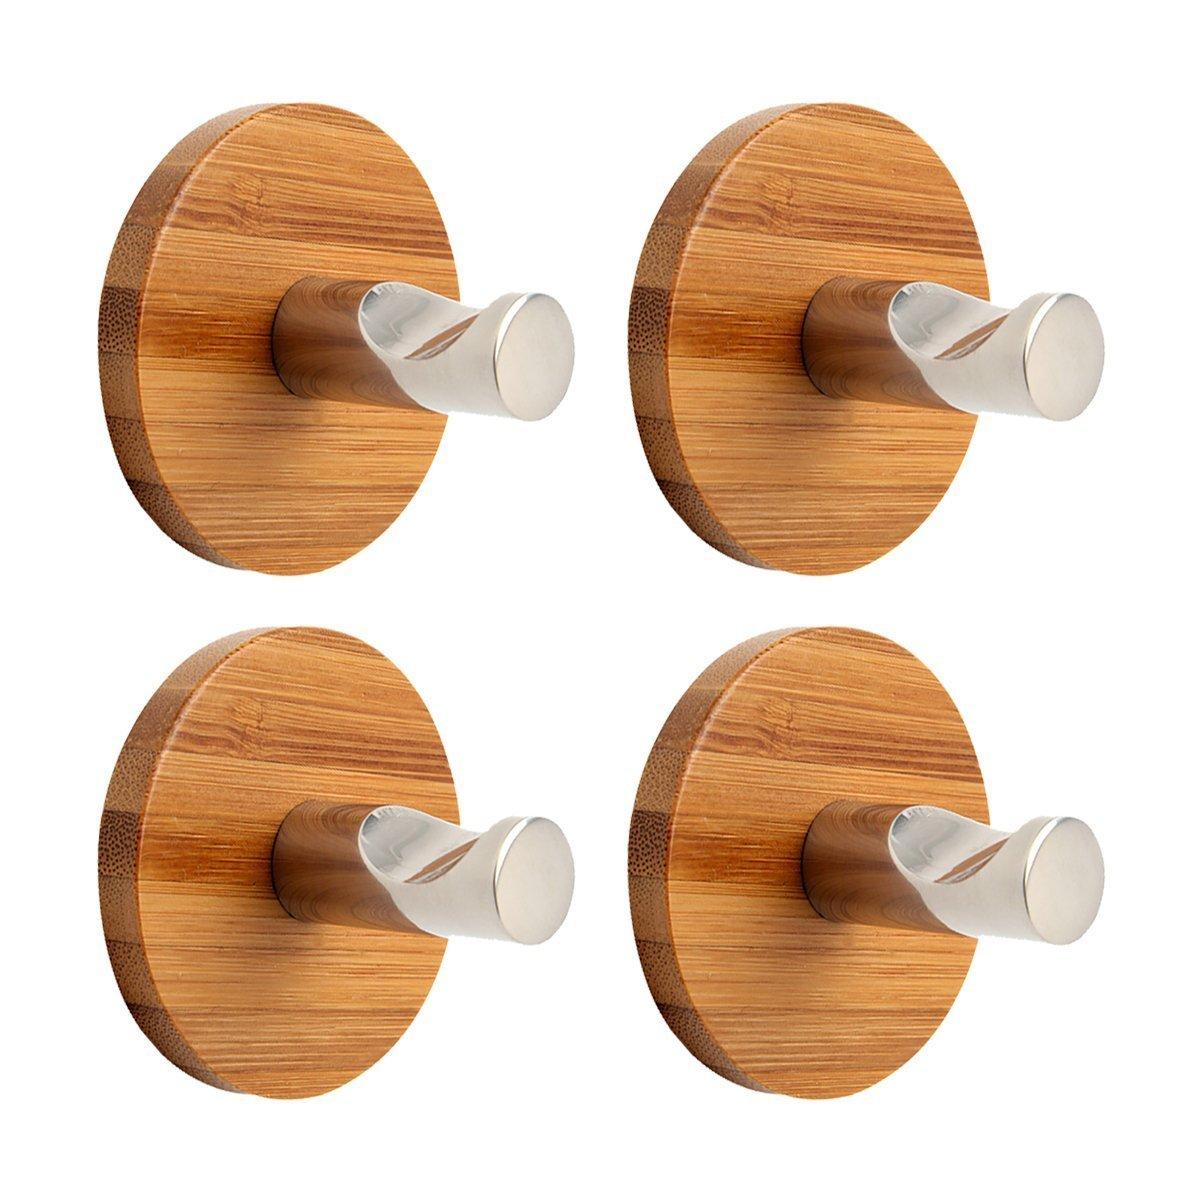 MOMO SZ Stainless Steel Adhesive Hooks Heavy Duty Hooks for Home Kitchen Bath 4 pcs Bamboo Hooks